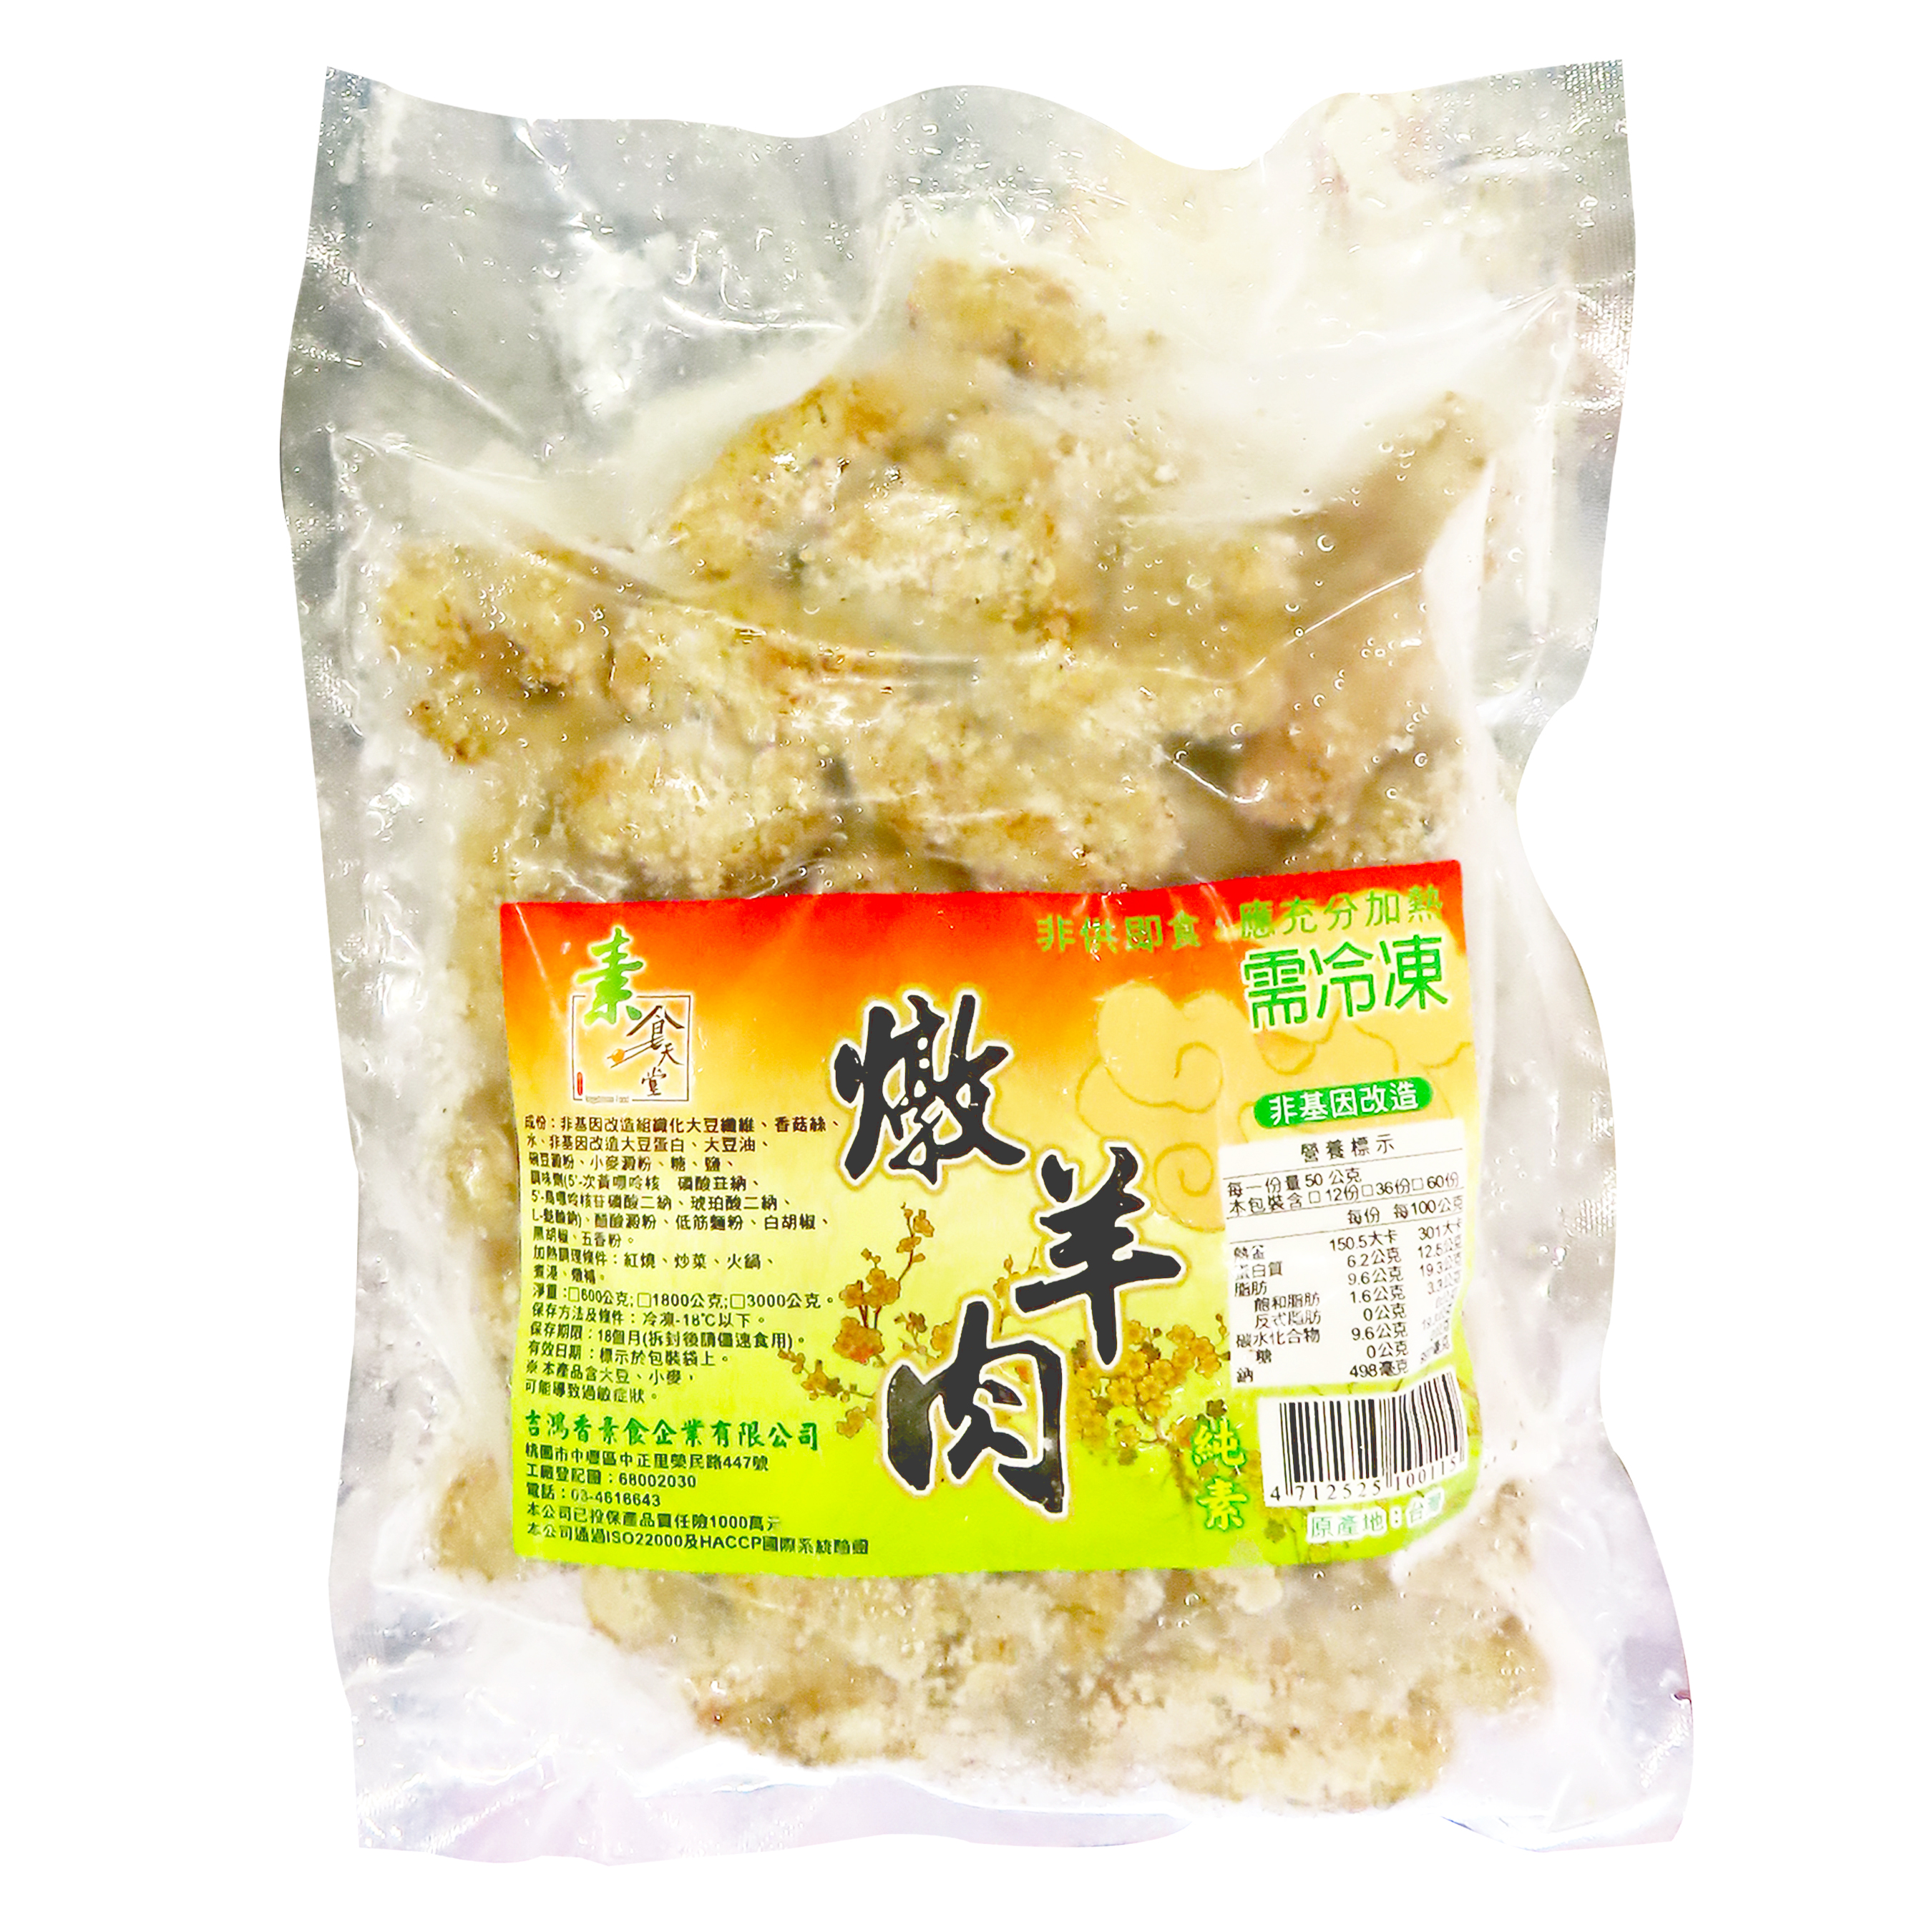 Image Vegan Stewed Mutton 素食天堂炖羊肉(纯) 600grams